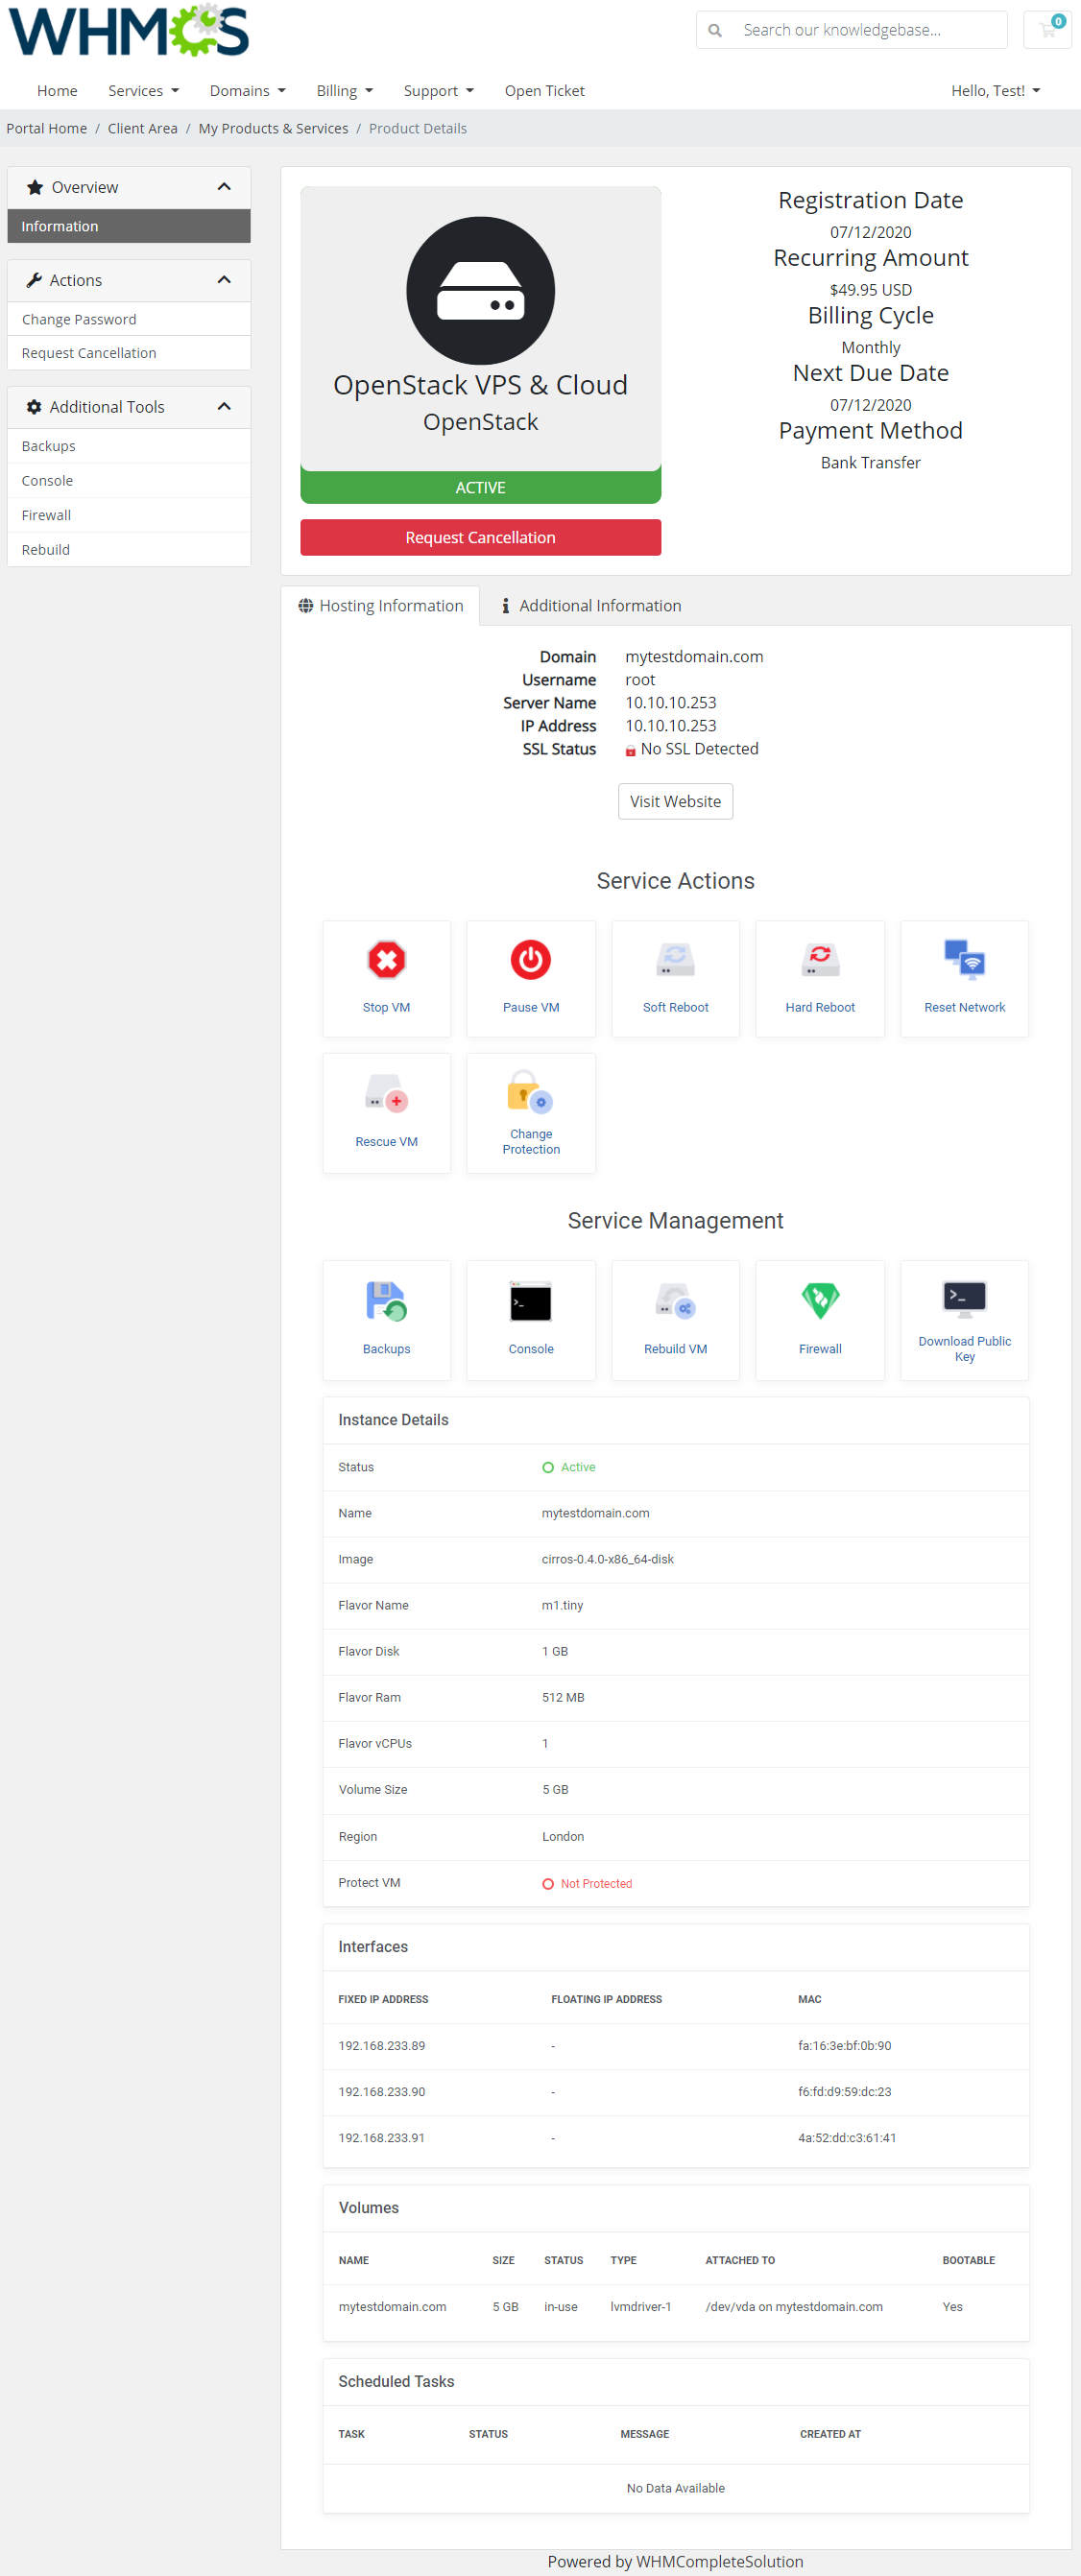 OpenStack VPS & Cloud For WHMCS: Module Screenshot 1